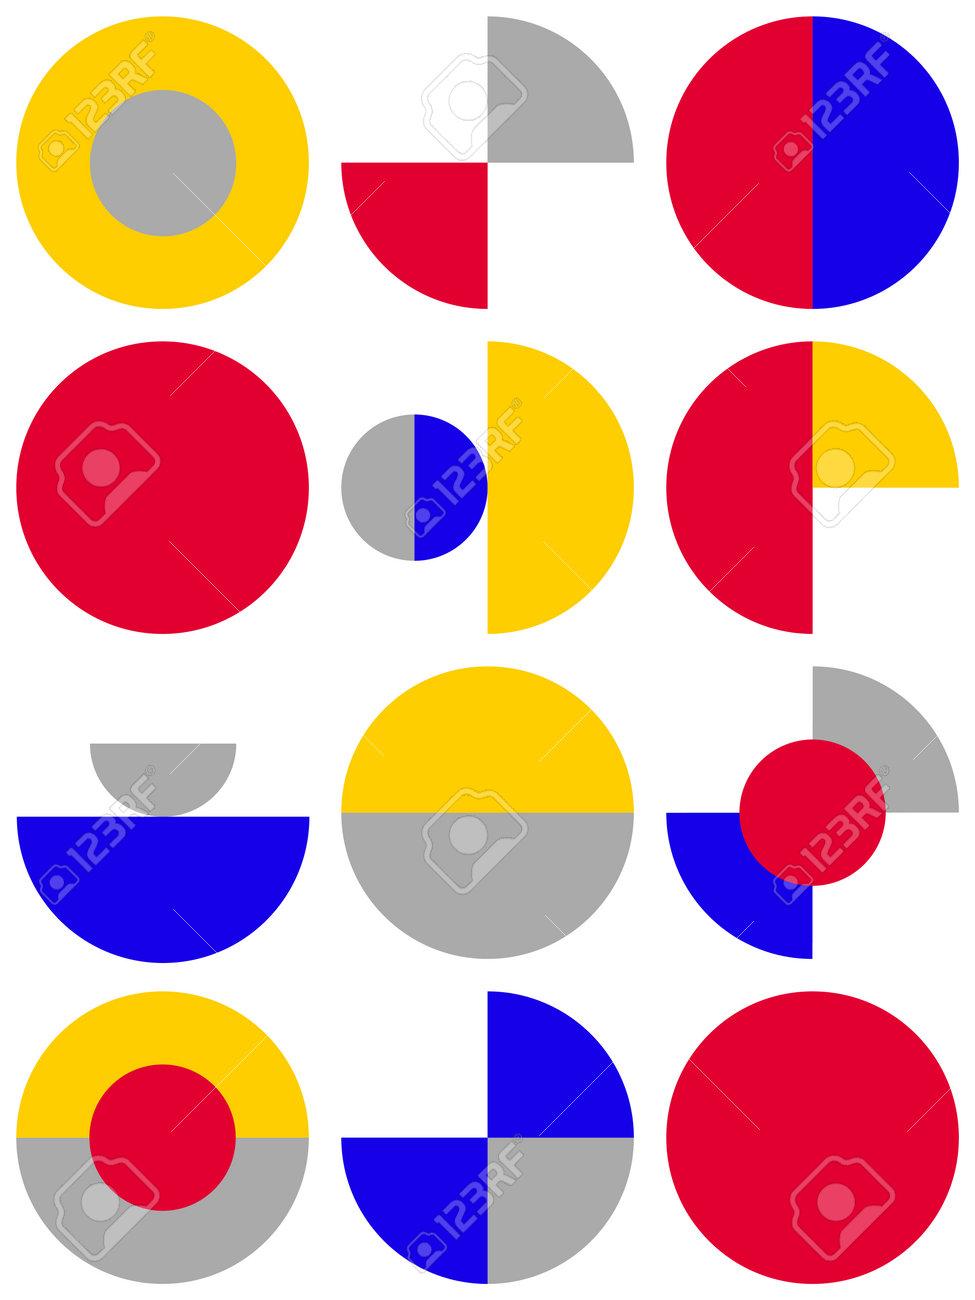 Trendy bauhaus pattern. Bauhaus poster. Vector geometric abstract circle shapes - 161245966